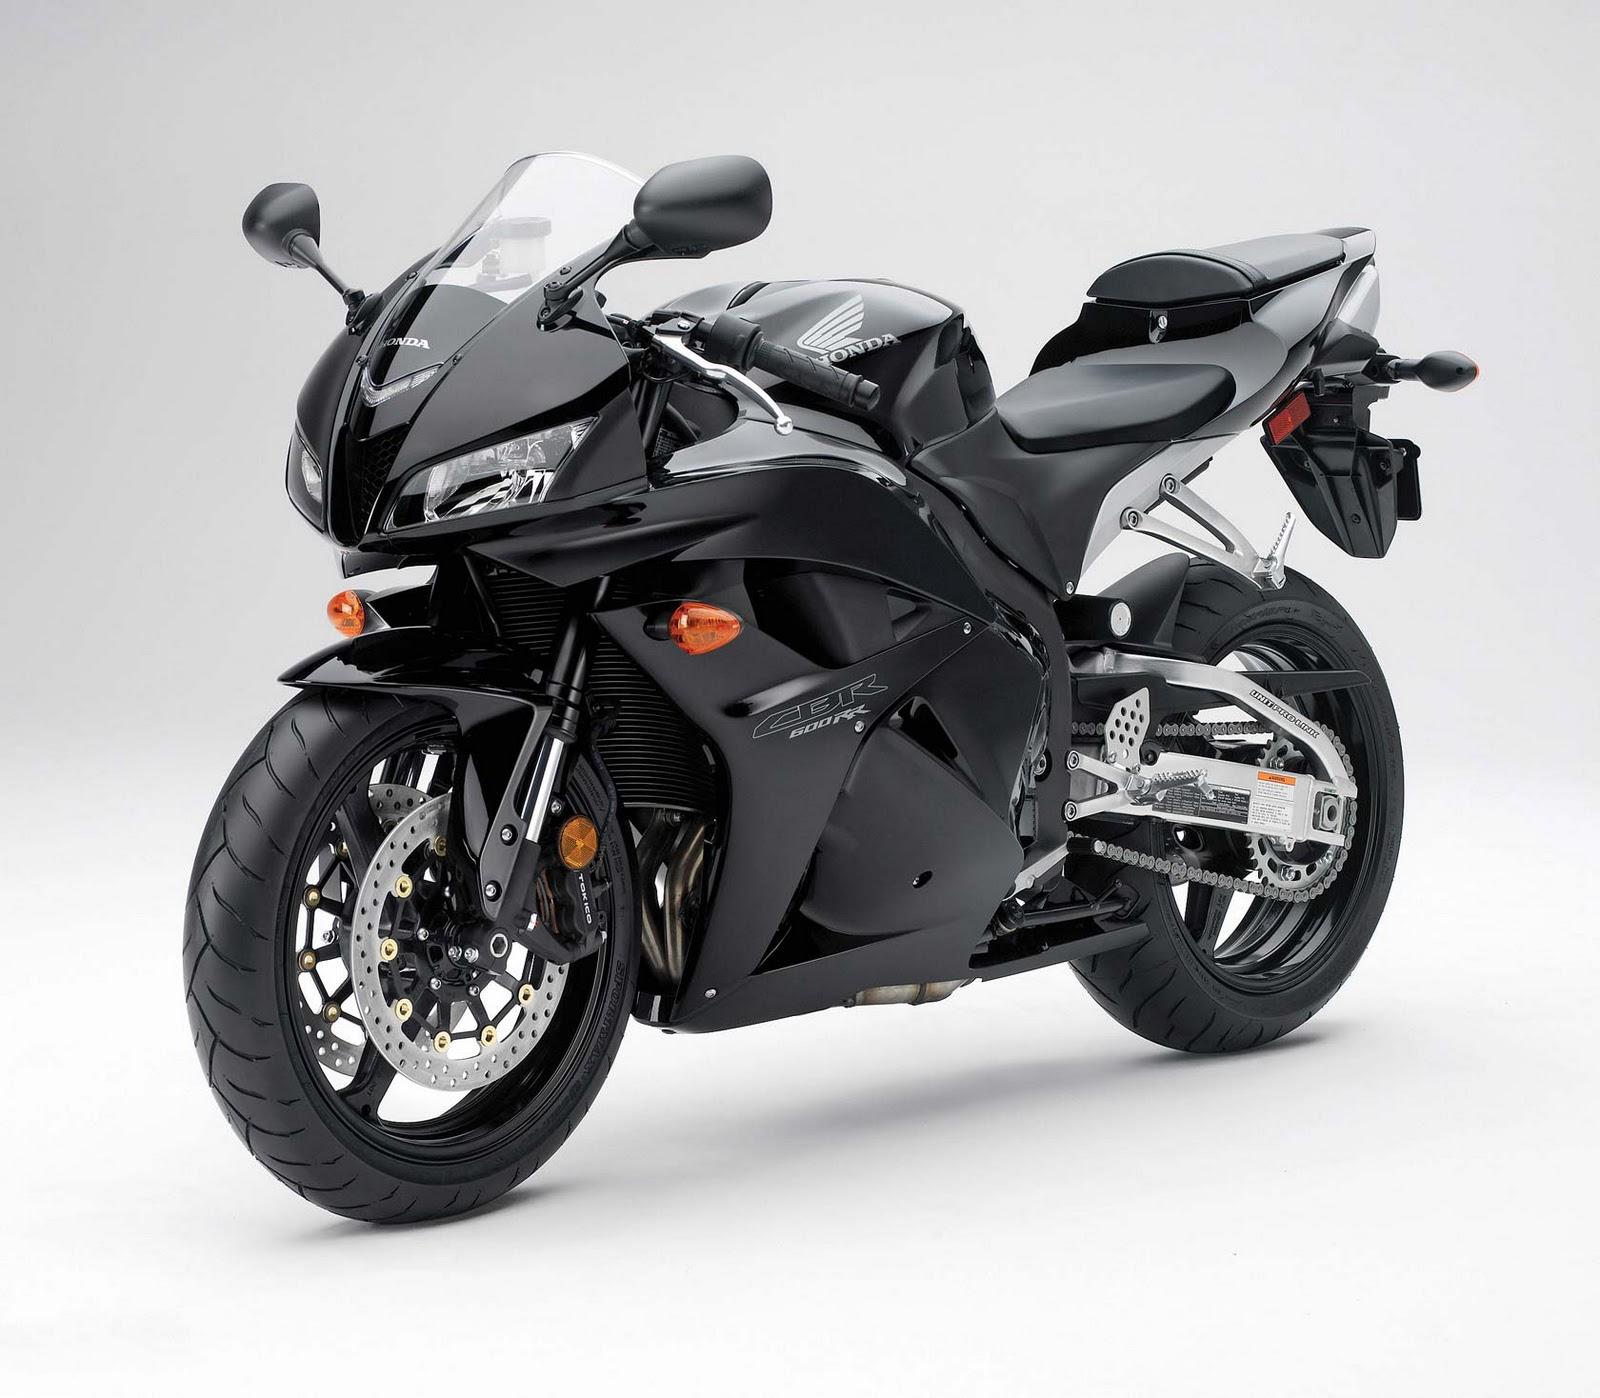 Honda Motorcycle Pictures Honda Cbr 600 Rr 2011